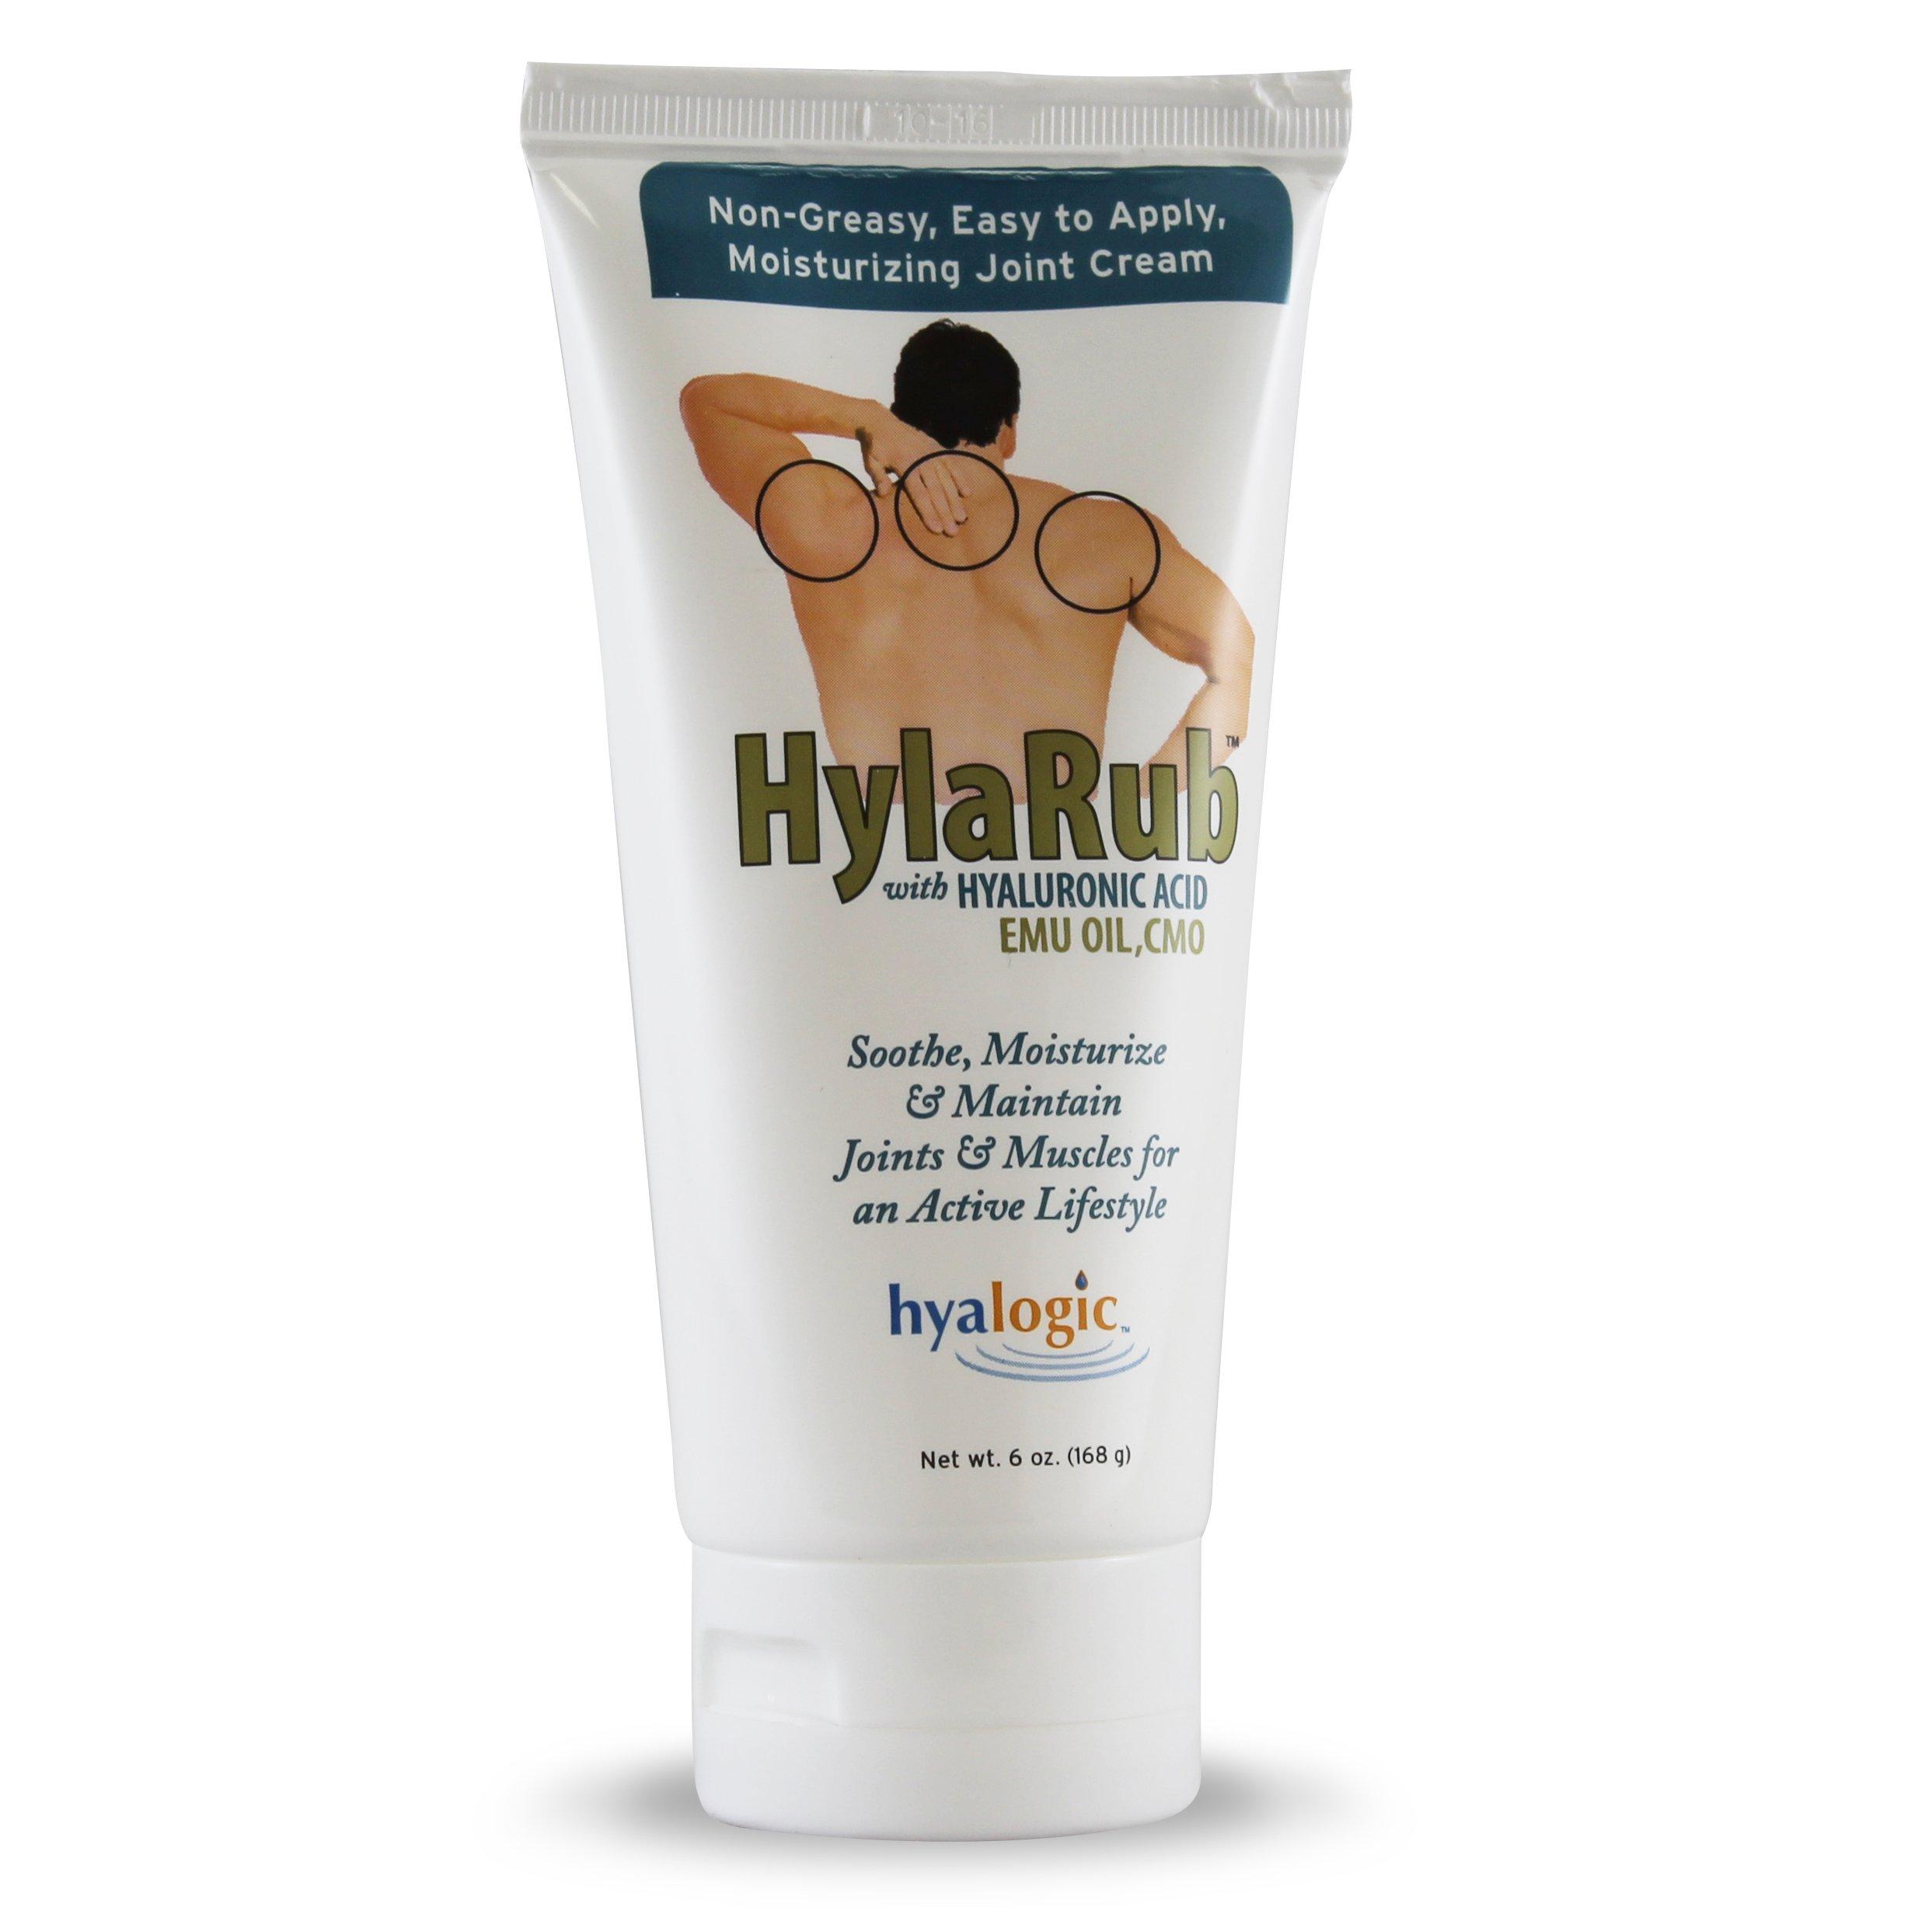 Hyalogic HylaRub - Hyaluronic Acid - Cetyl Myristoleate - Emu Oil - HA Soothing & Moisturizing Joint & Muscle Cream - 6 ounces (FFP)